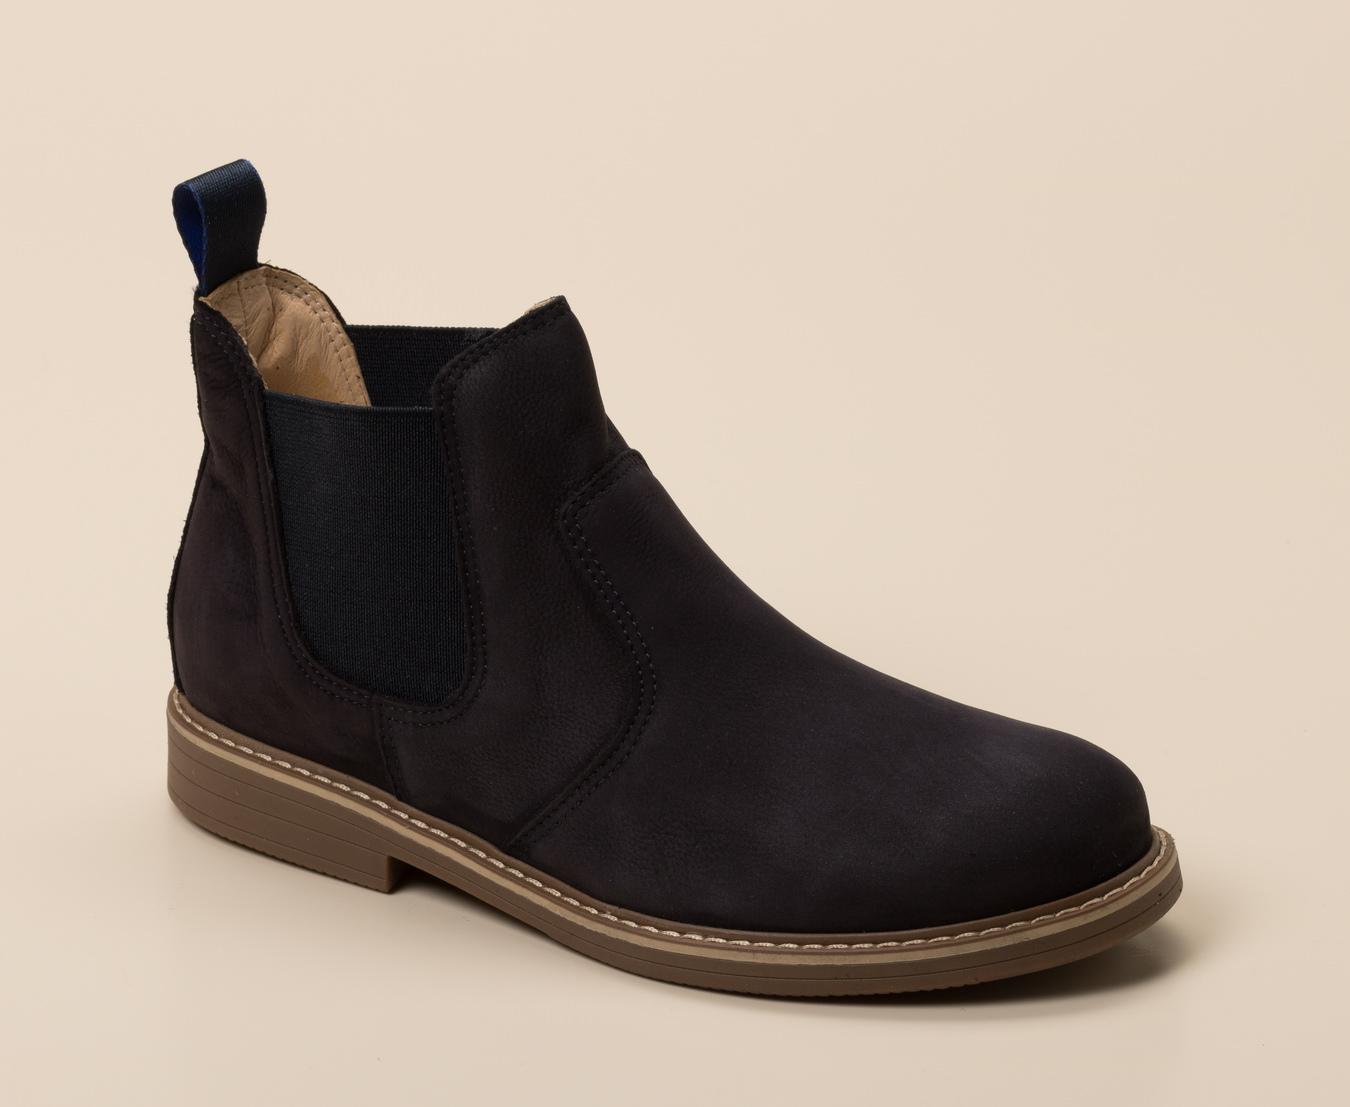 0f914dfdd1d434 Ralph Harrison Classic Kinder Chelsea-Boots in dunkelblau kaufen ...